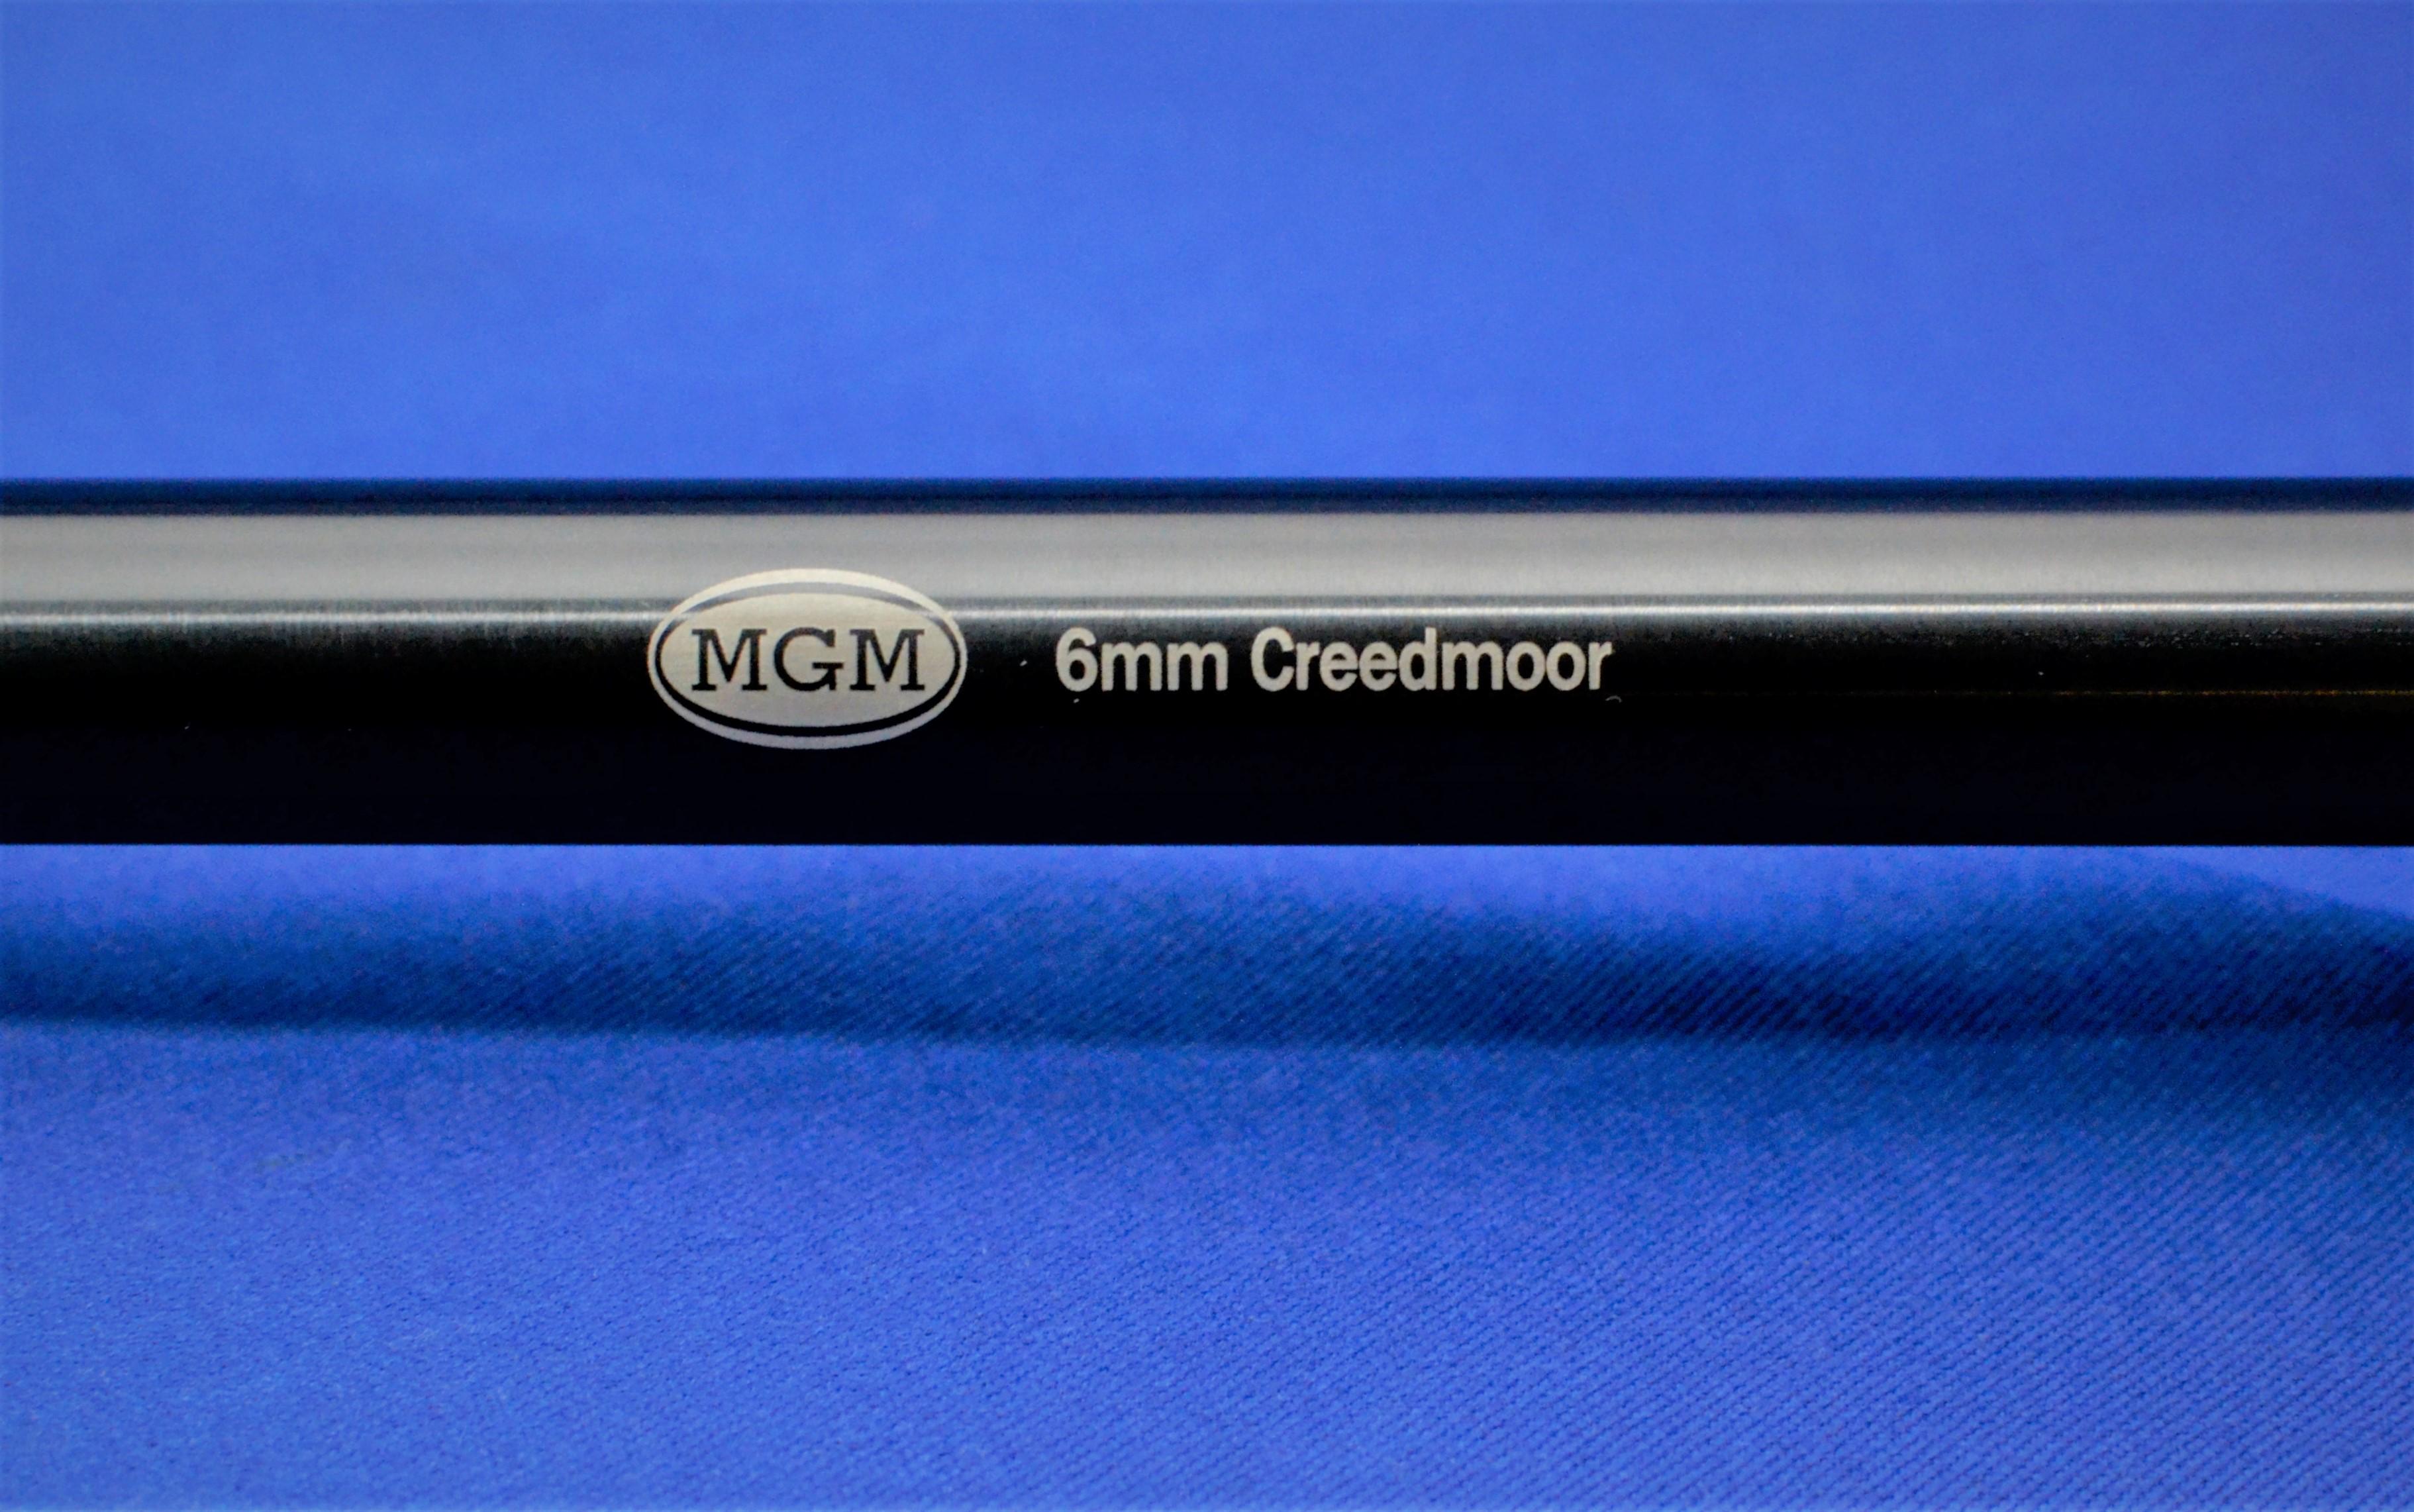 Thompson Center Encore, Match Grade Machine, MGM, Barrels, Rifles, Pistols, 6mm Creedmoor, Chrome Moly Blued